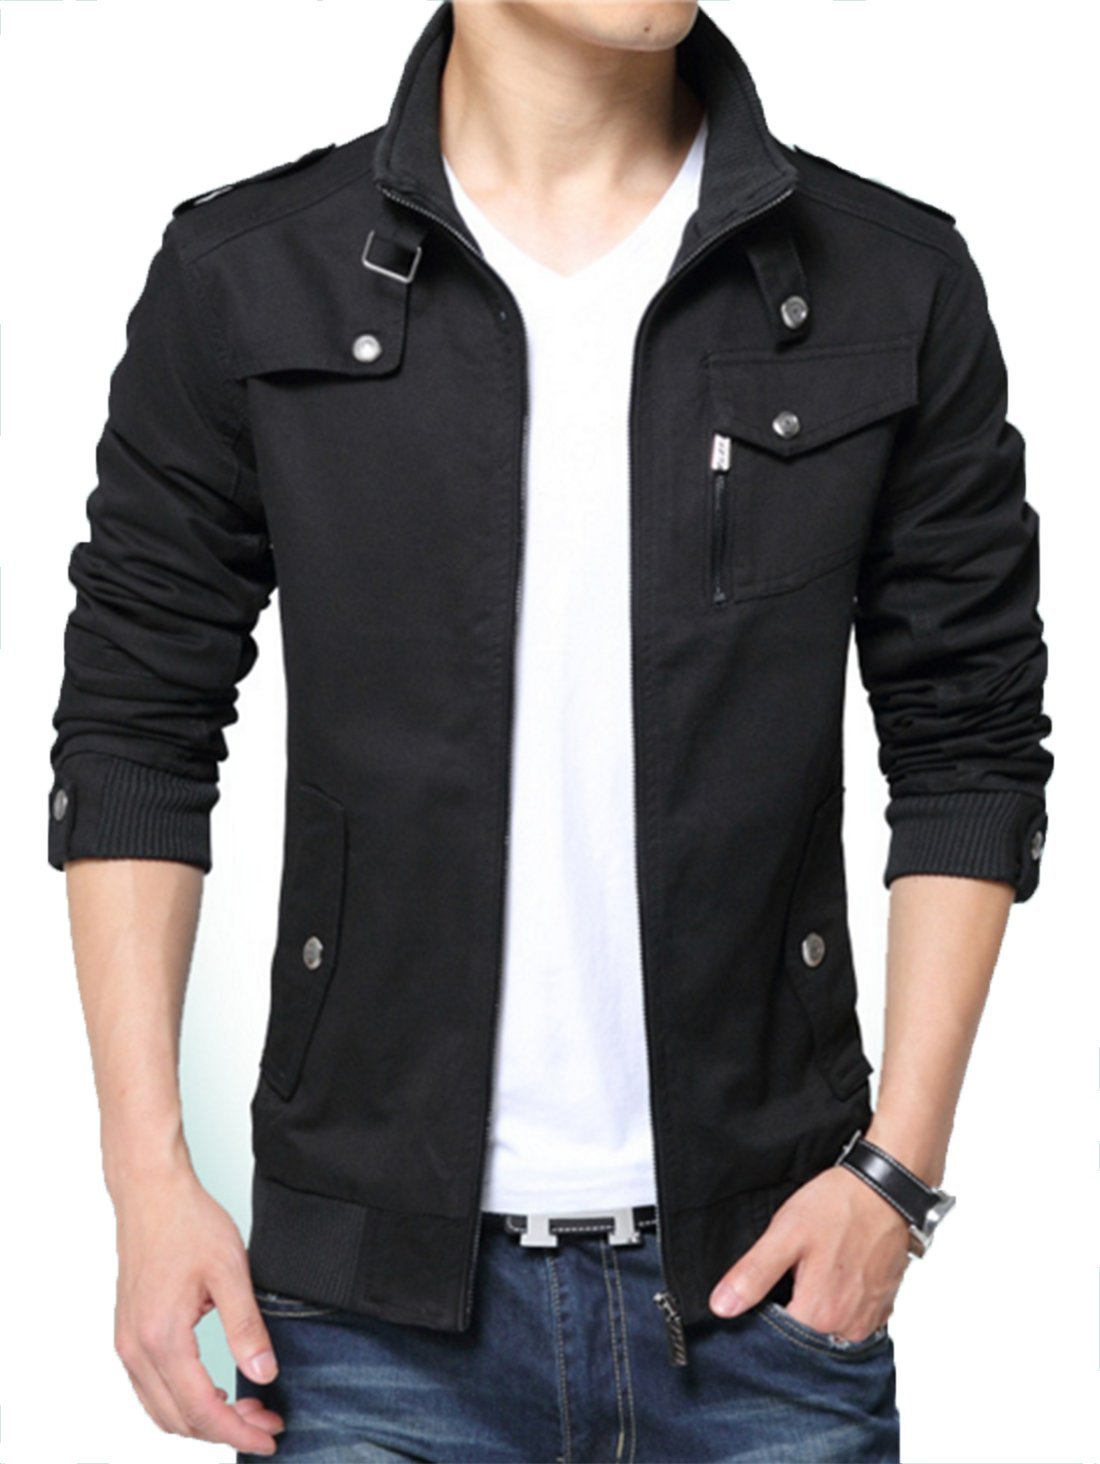 Kjdshwa Men's Long Sleeve Full Zip Lightweight Jacket(Black 888,M Size)